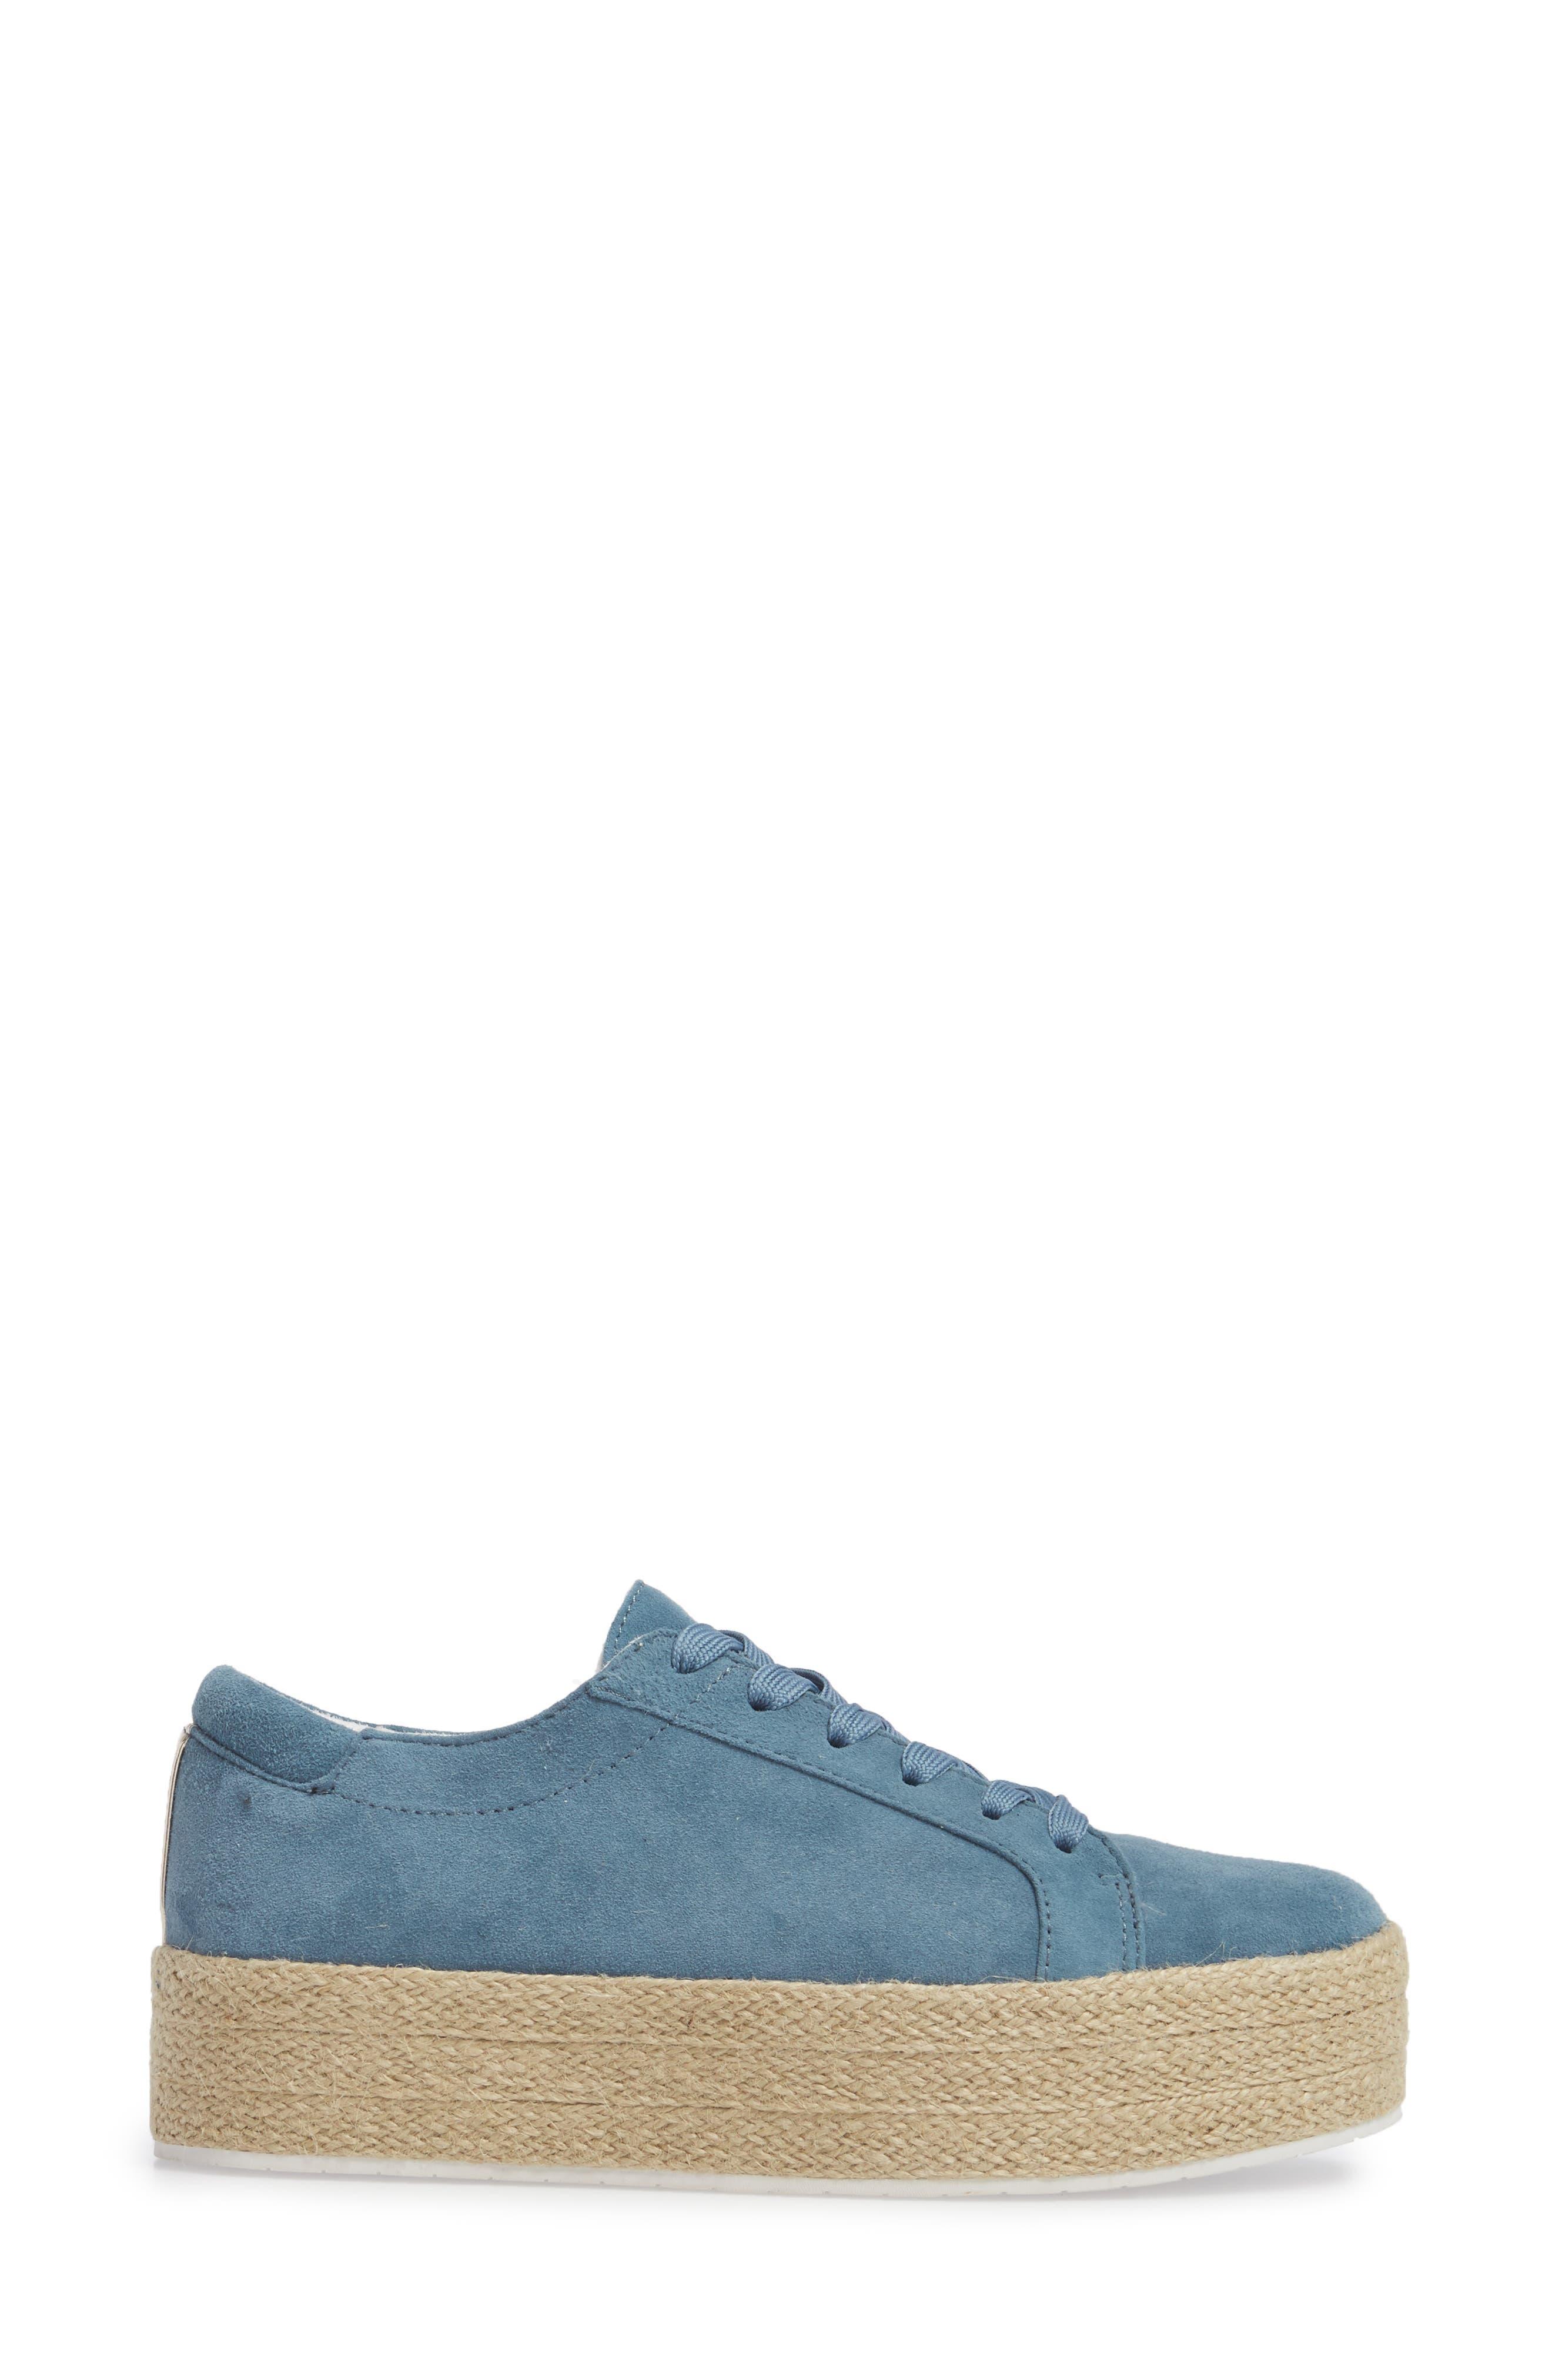 Allyson Espadrille Platform Sneaker,                             Alternate thumbnail 11, color,